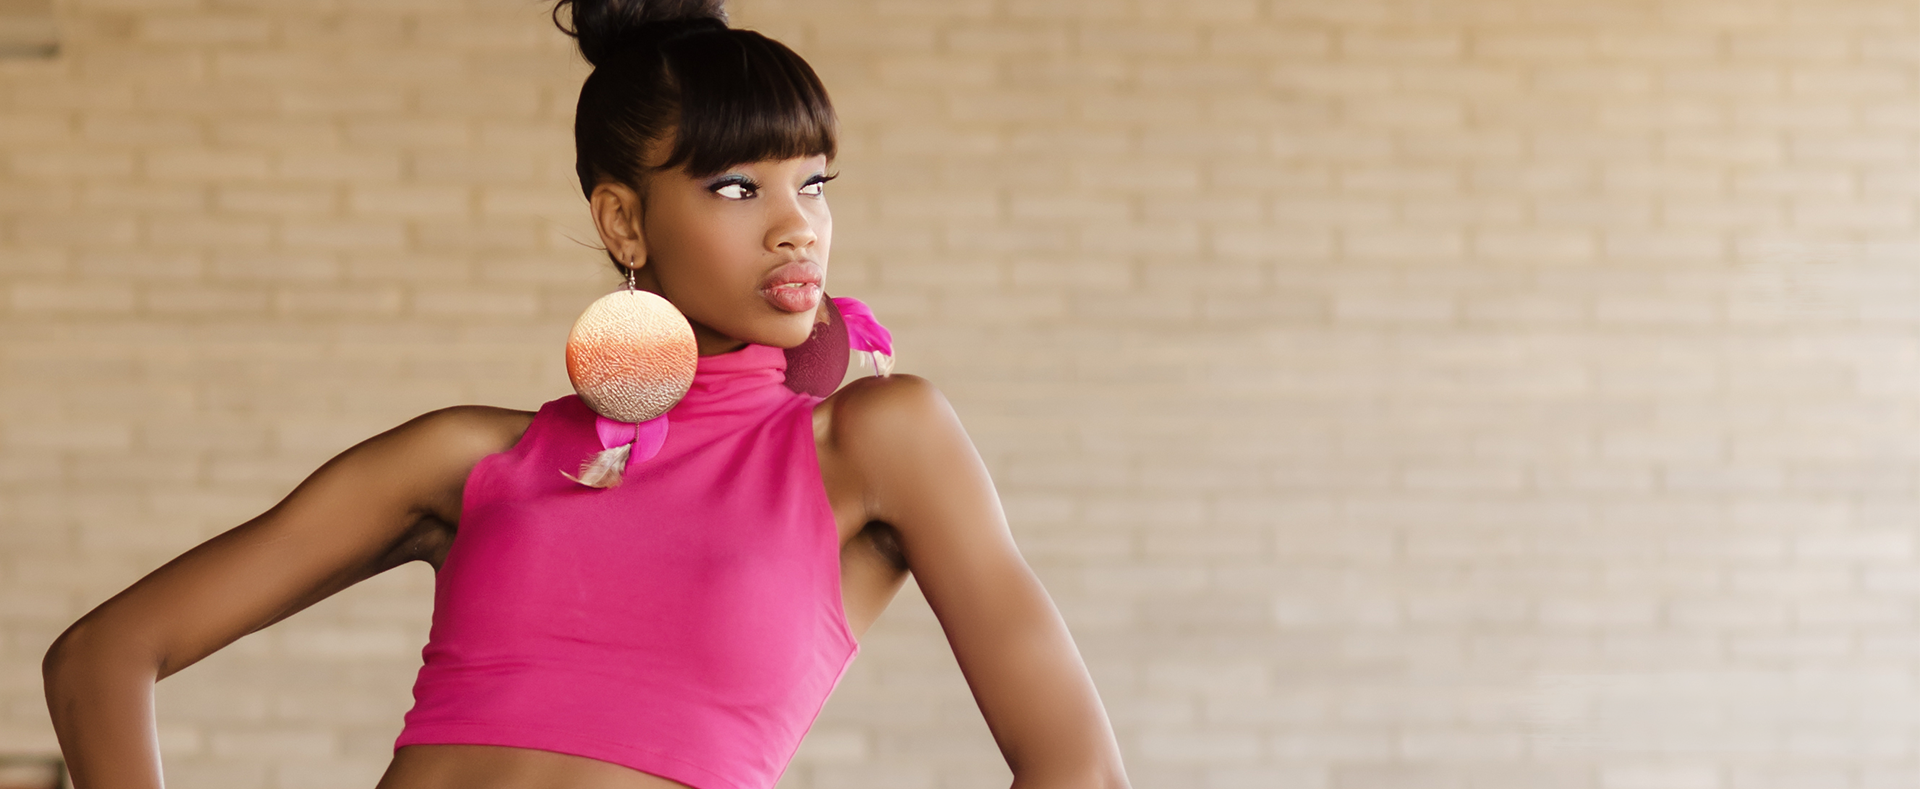 Girl in pink top posing